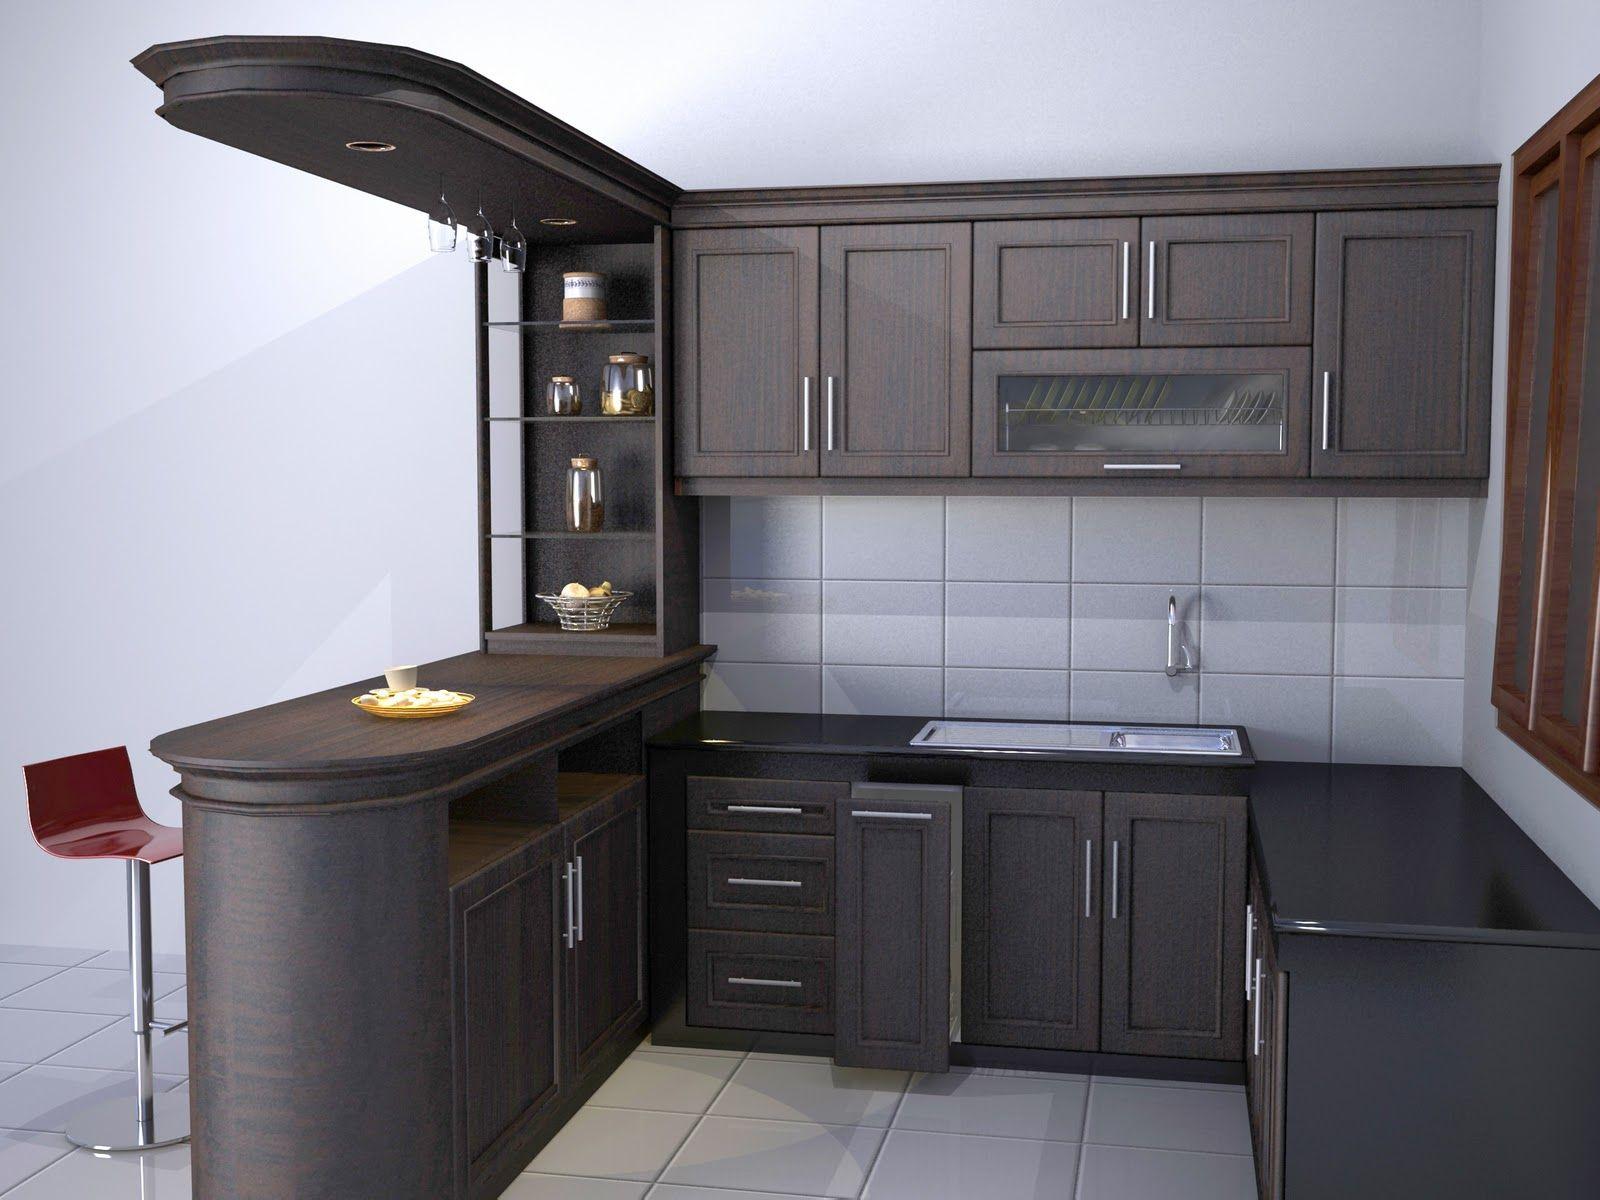 Harga 70 Model Gambar Kitchen Set Minimalis Memiliki Dapur Yang Rapi Bersih Dan Semua Barang Tertata Adalah Impian Setiap Orang Den